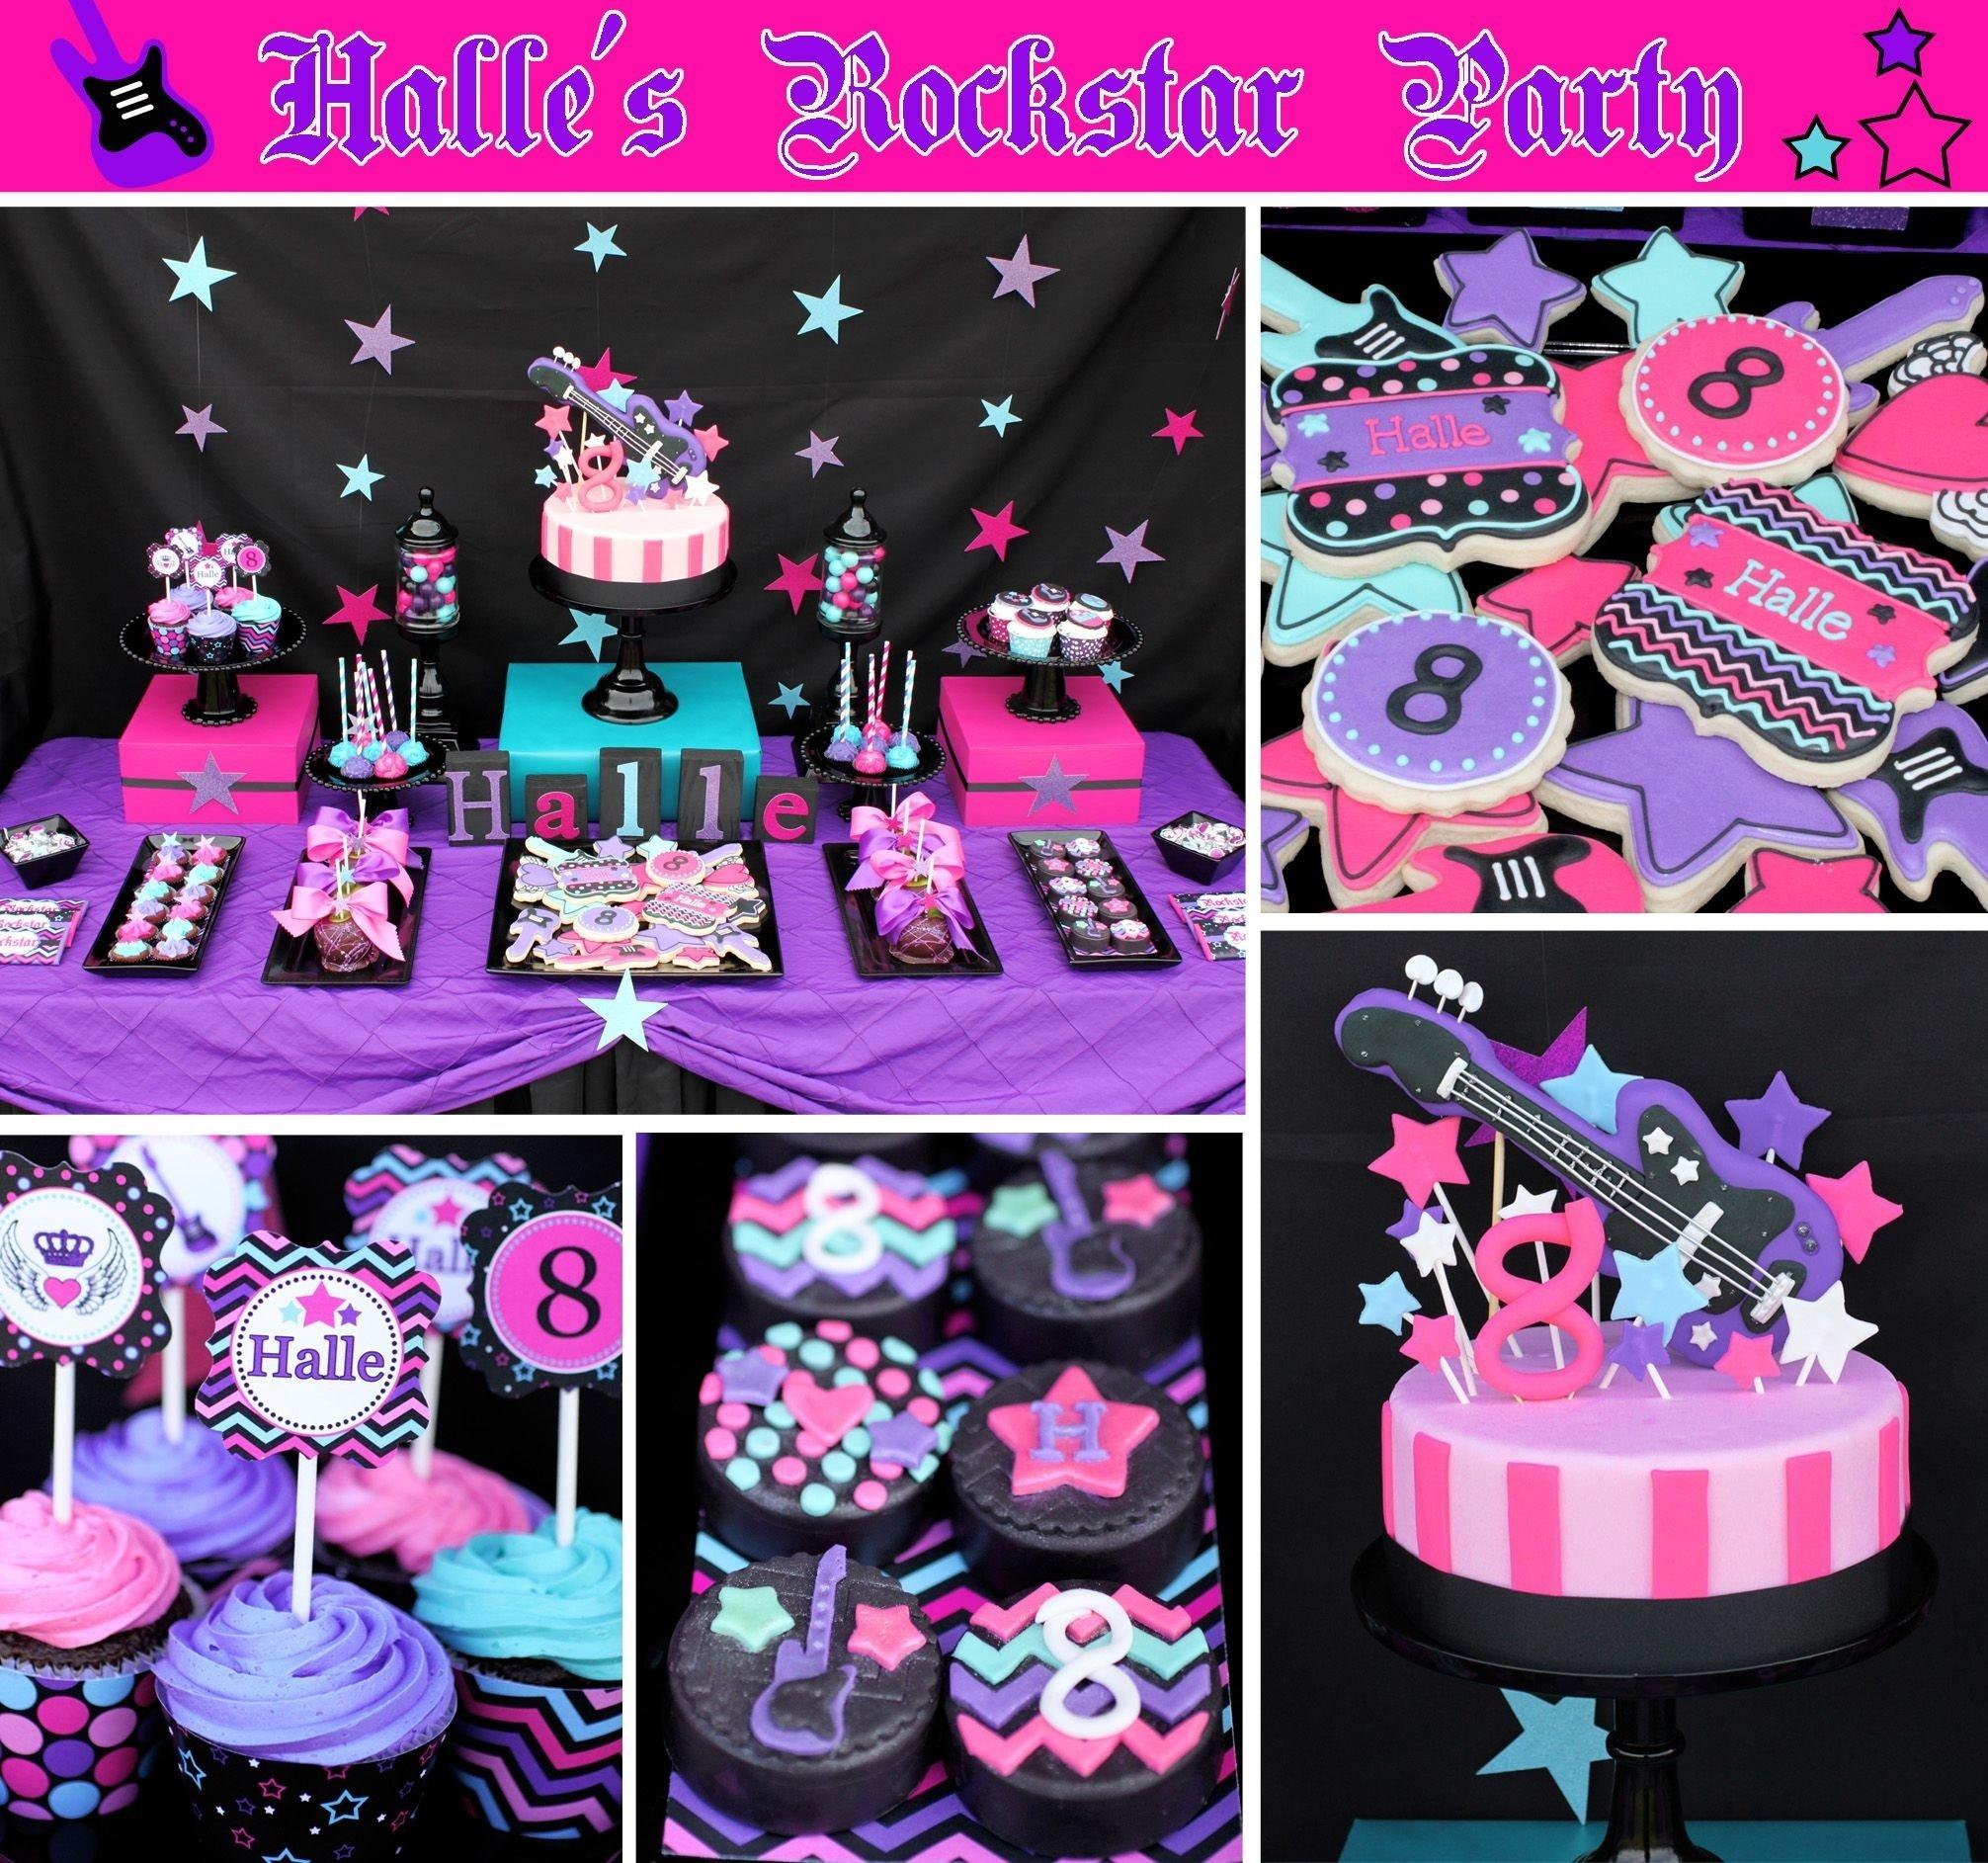 halles rockstar birthday party cake cupcakes rock star   rockstar